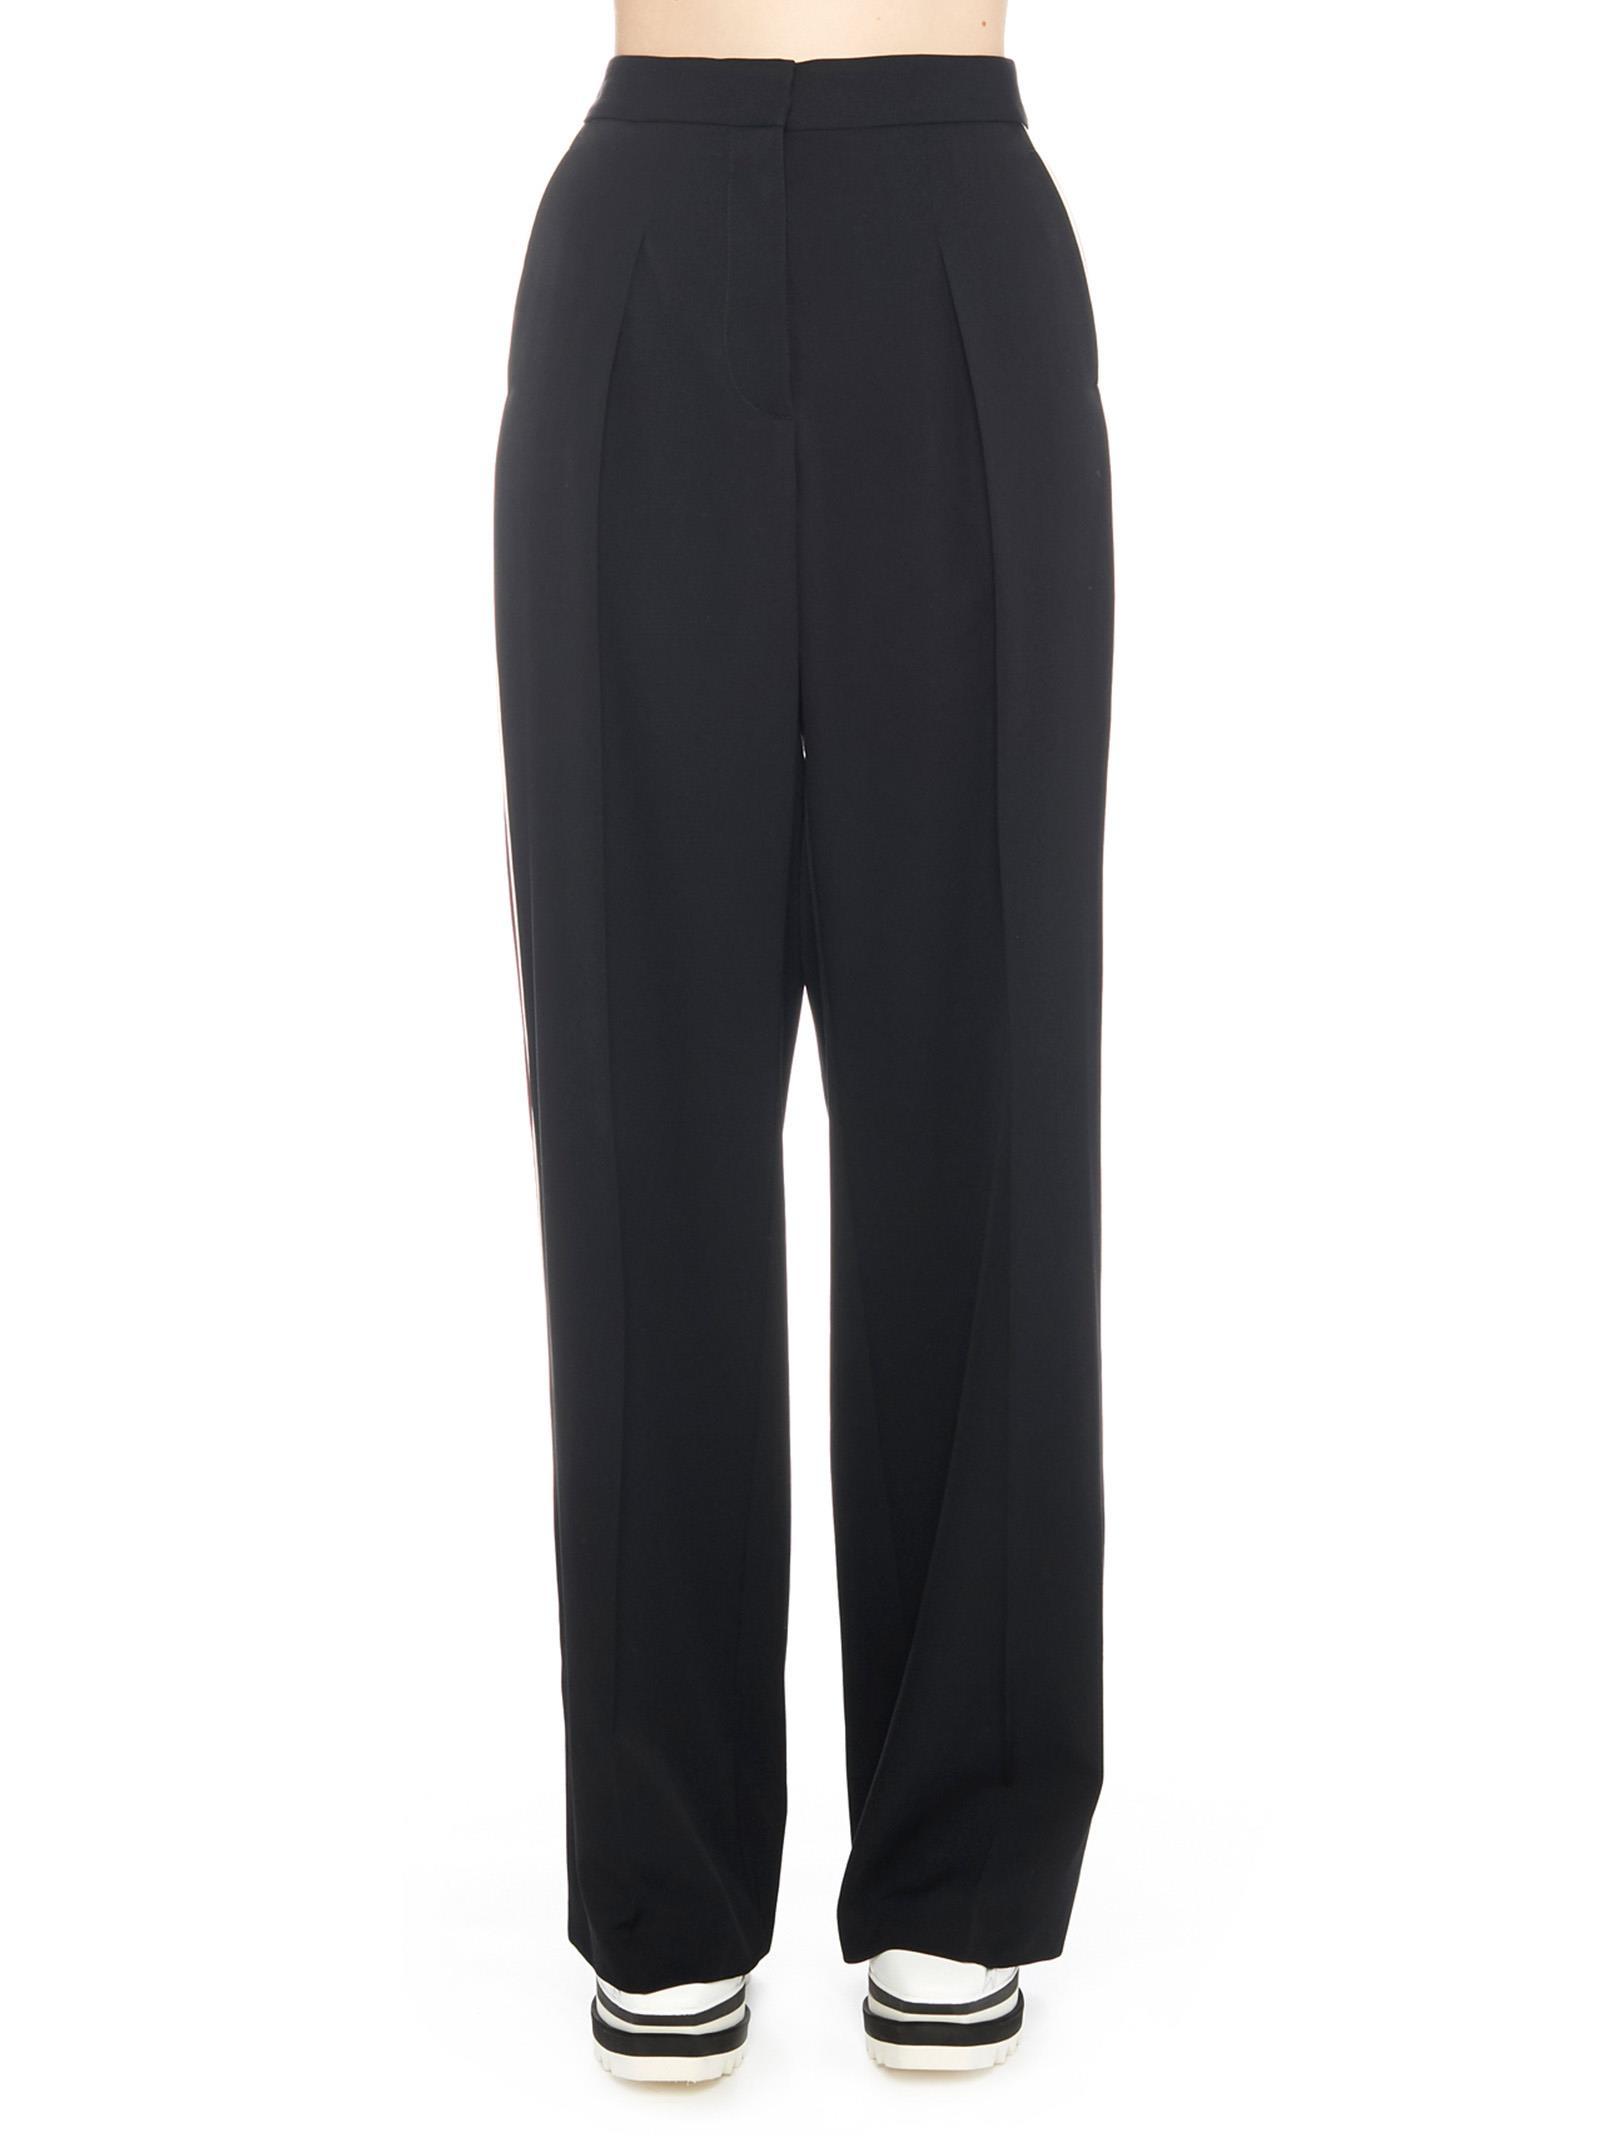 Stella Mccartney japanese Tayloring Pants